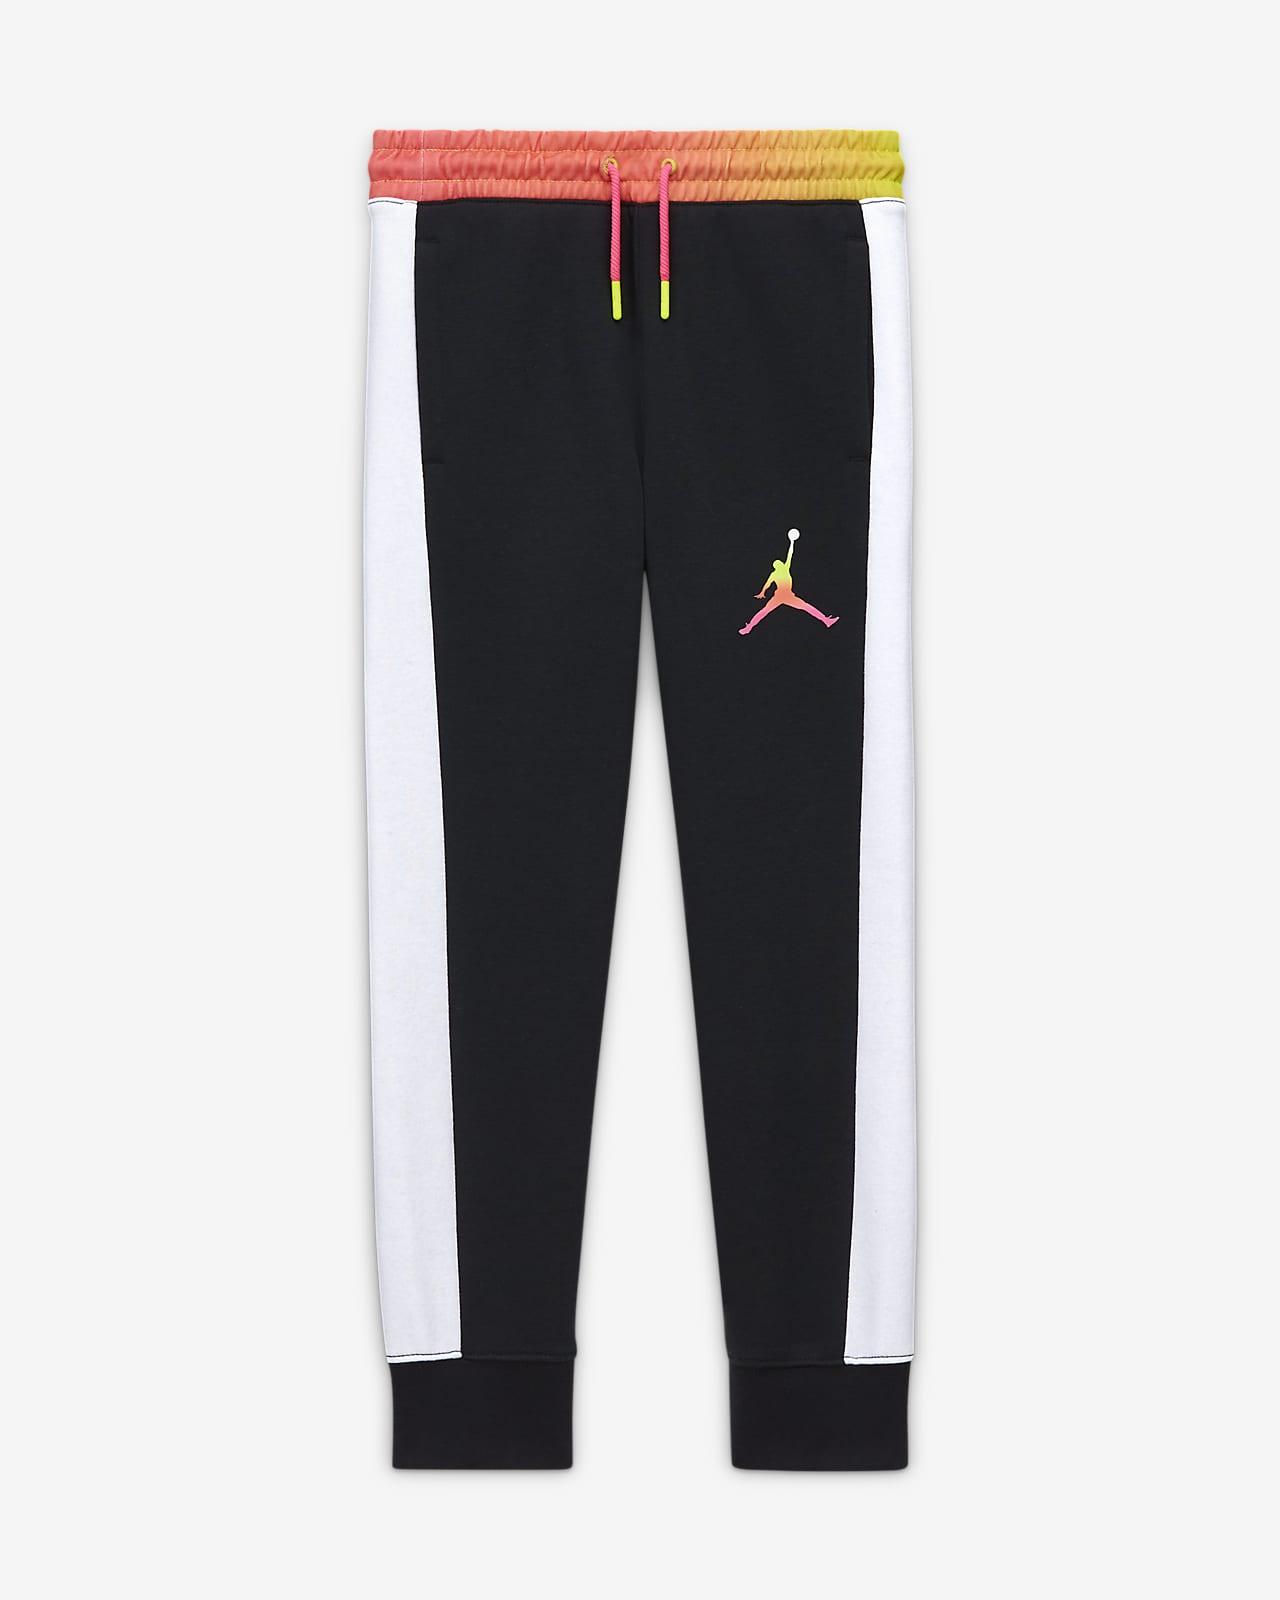 Jordan Big Kids' (Girls') Pants. Nike.com